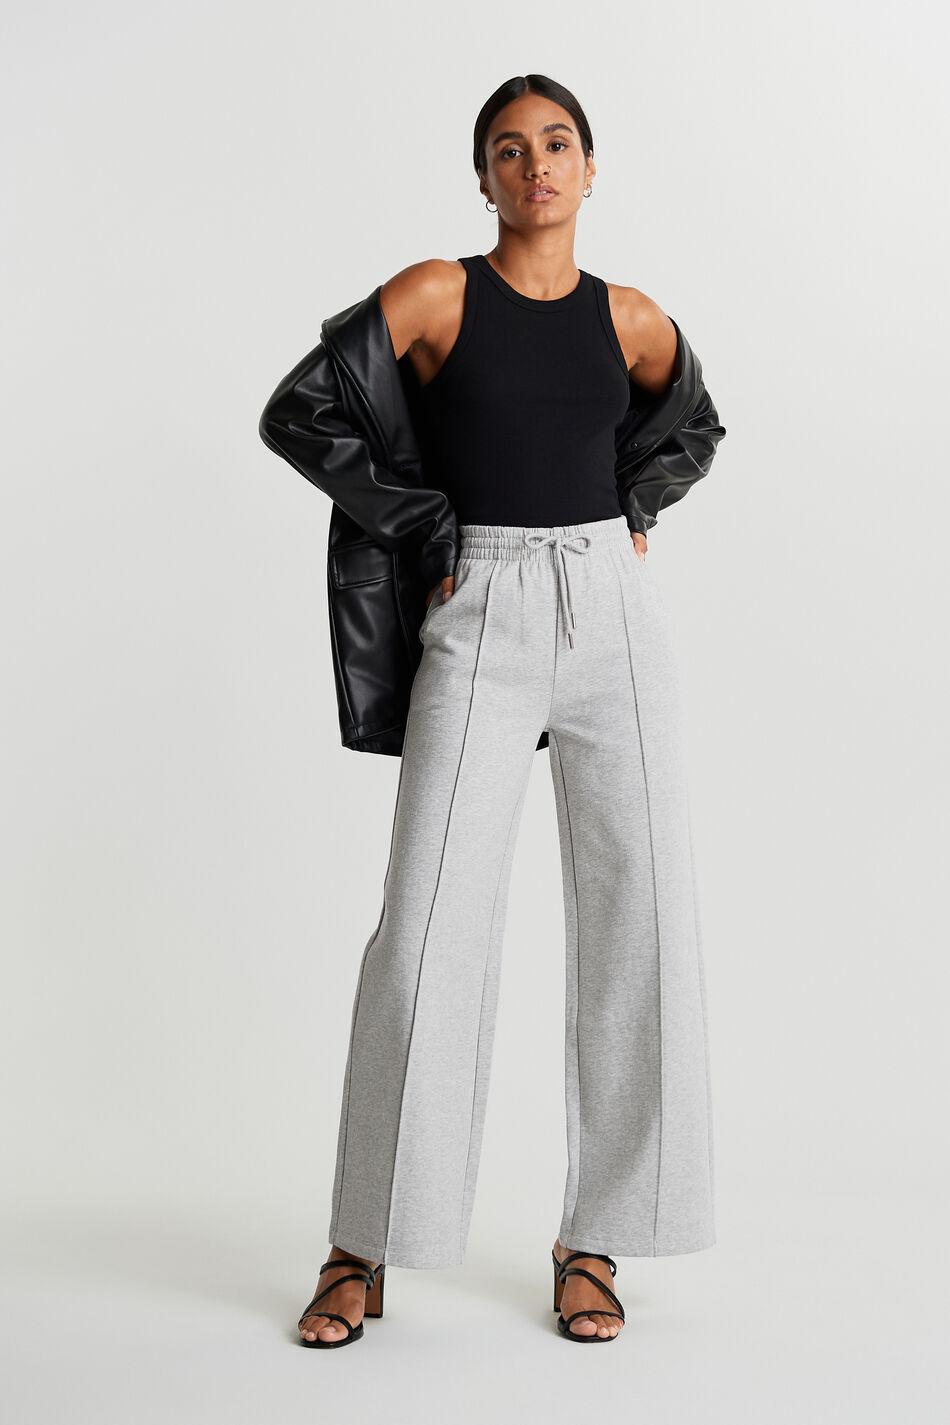 Gina Tricot Bonnie sweatpants XS Female Grey melange (8181)